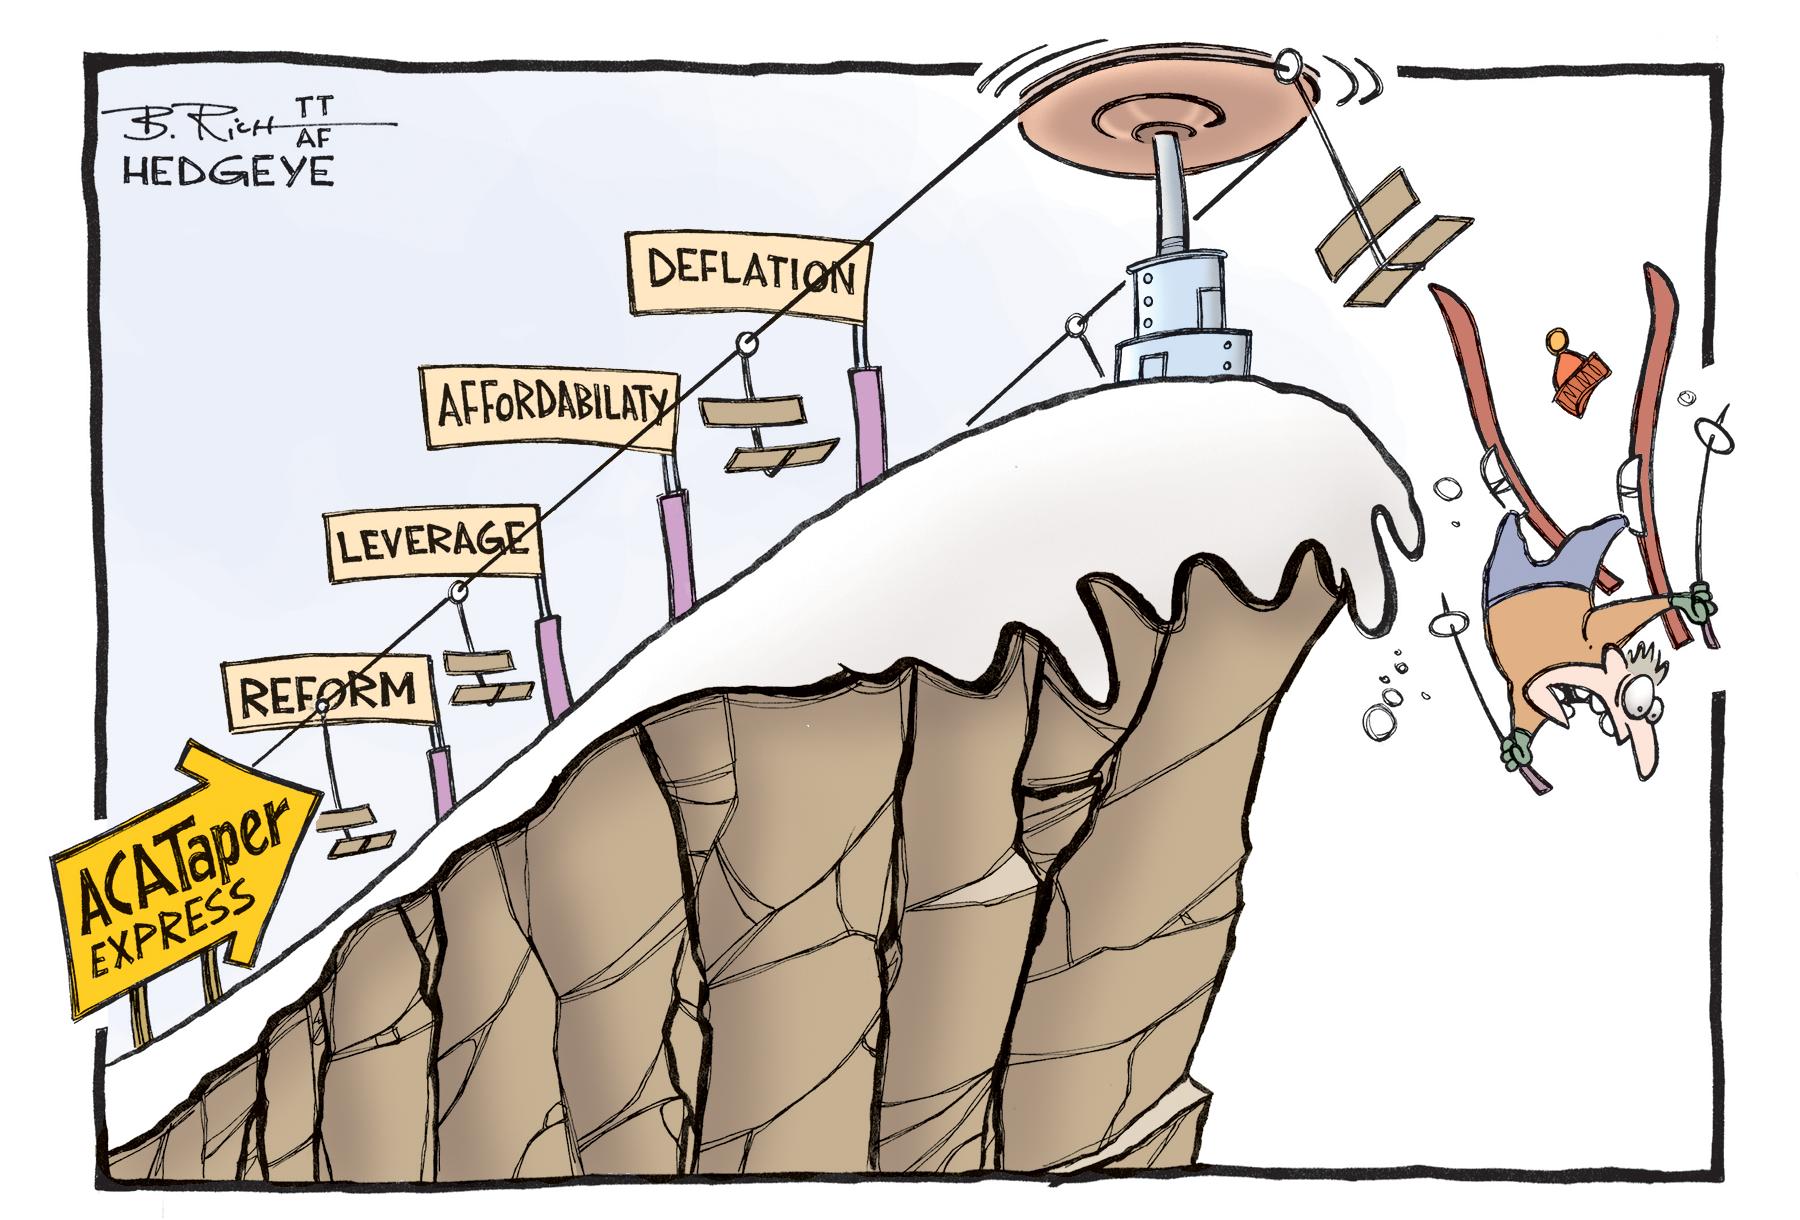 Risultati immagini per debt deflation hedgeye